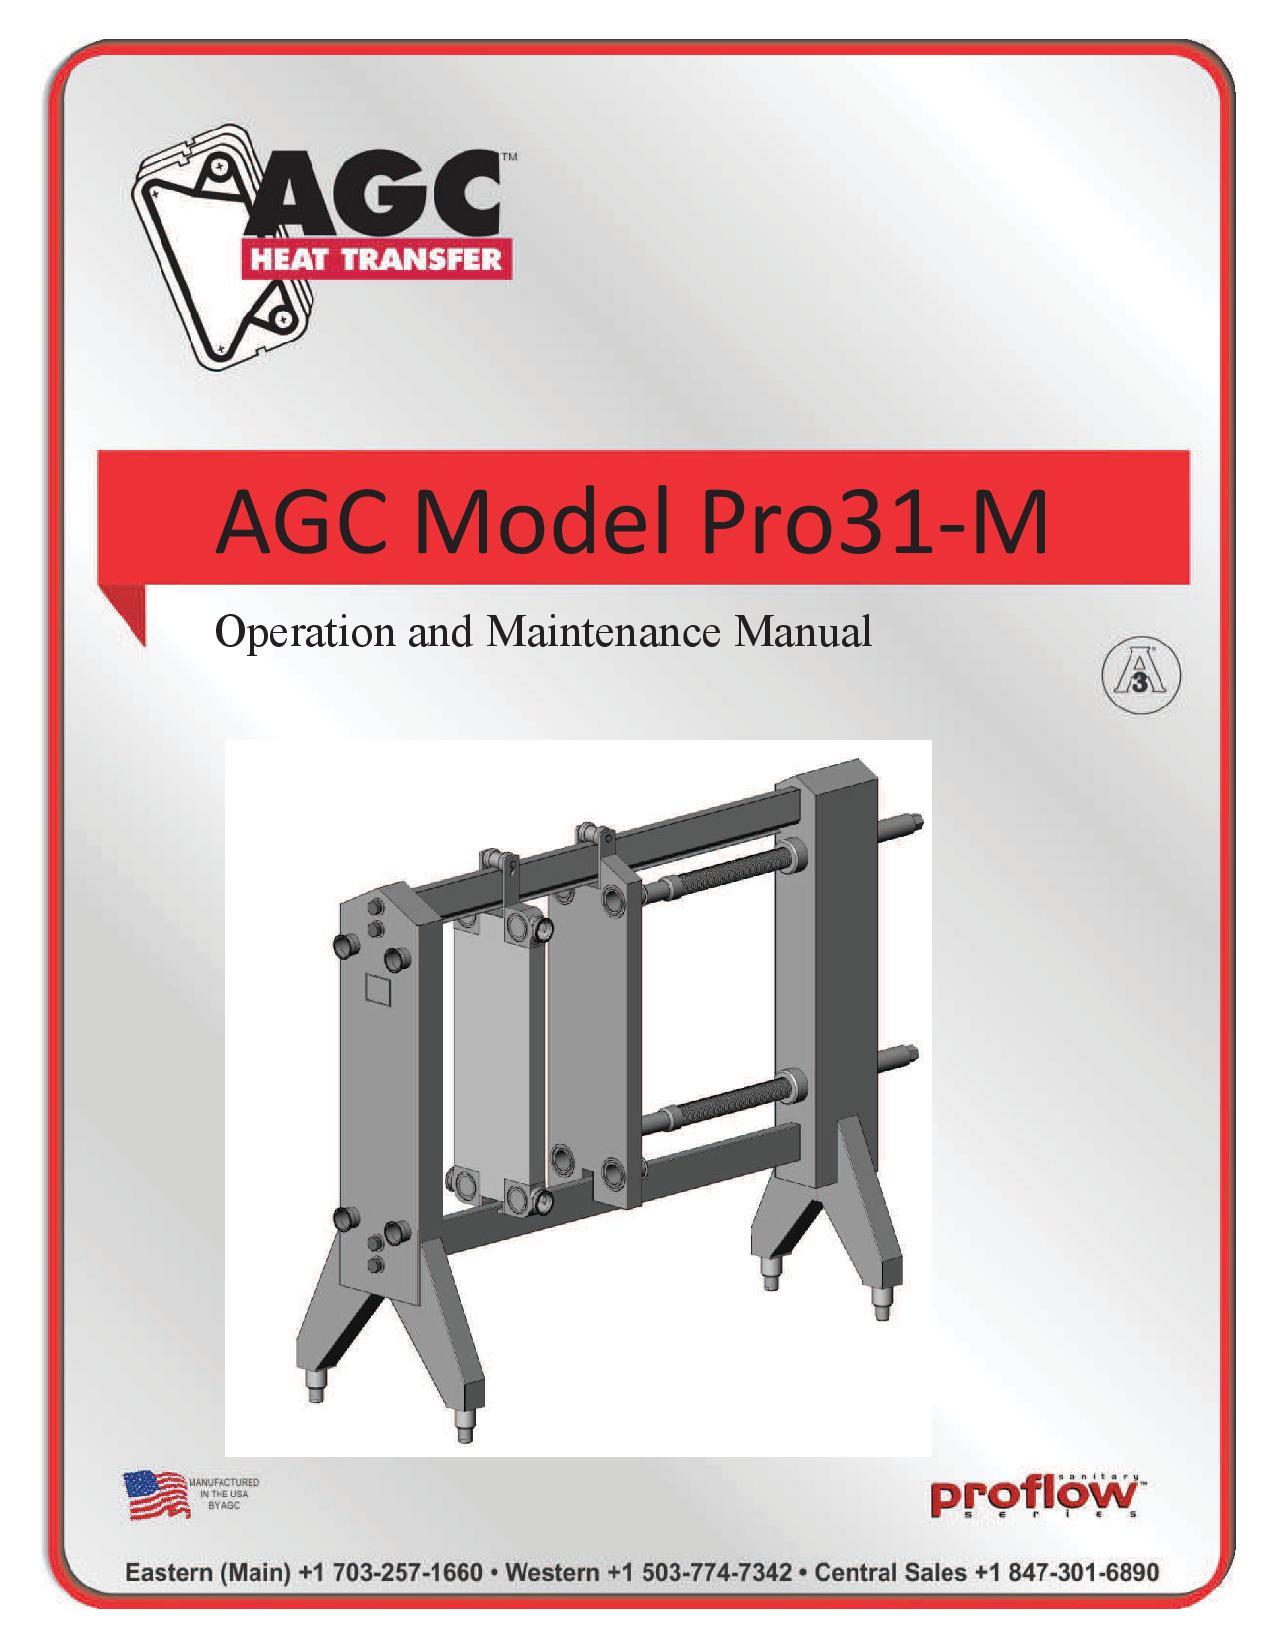 AGC Operating Manual Pro31-M